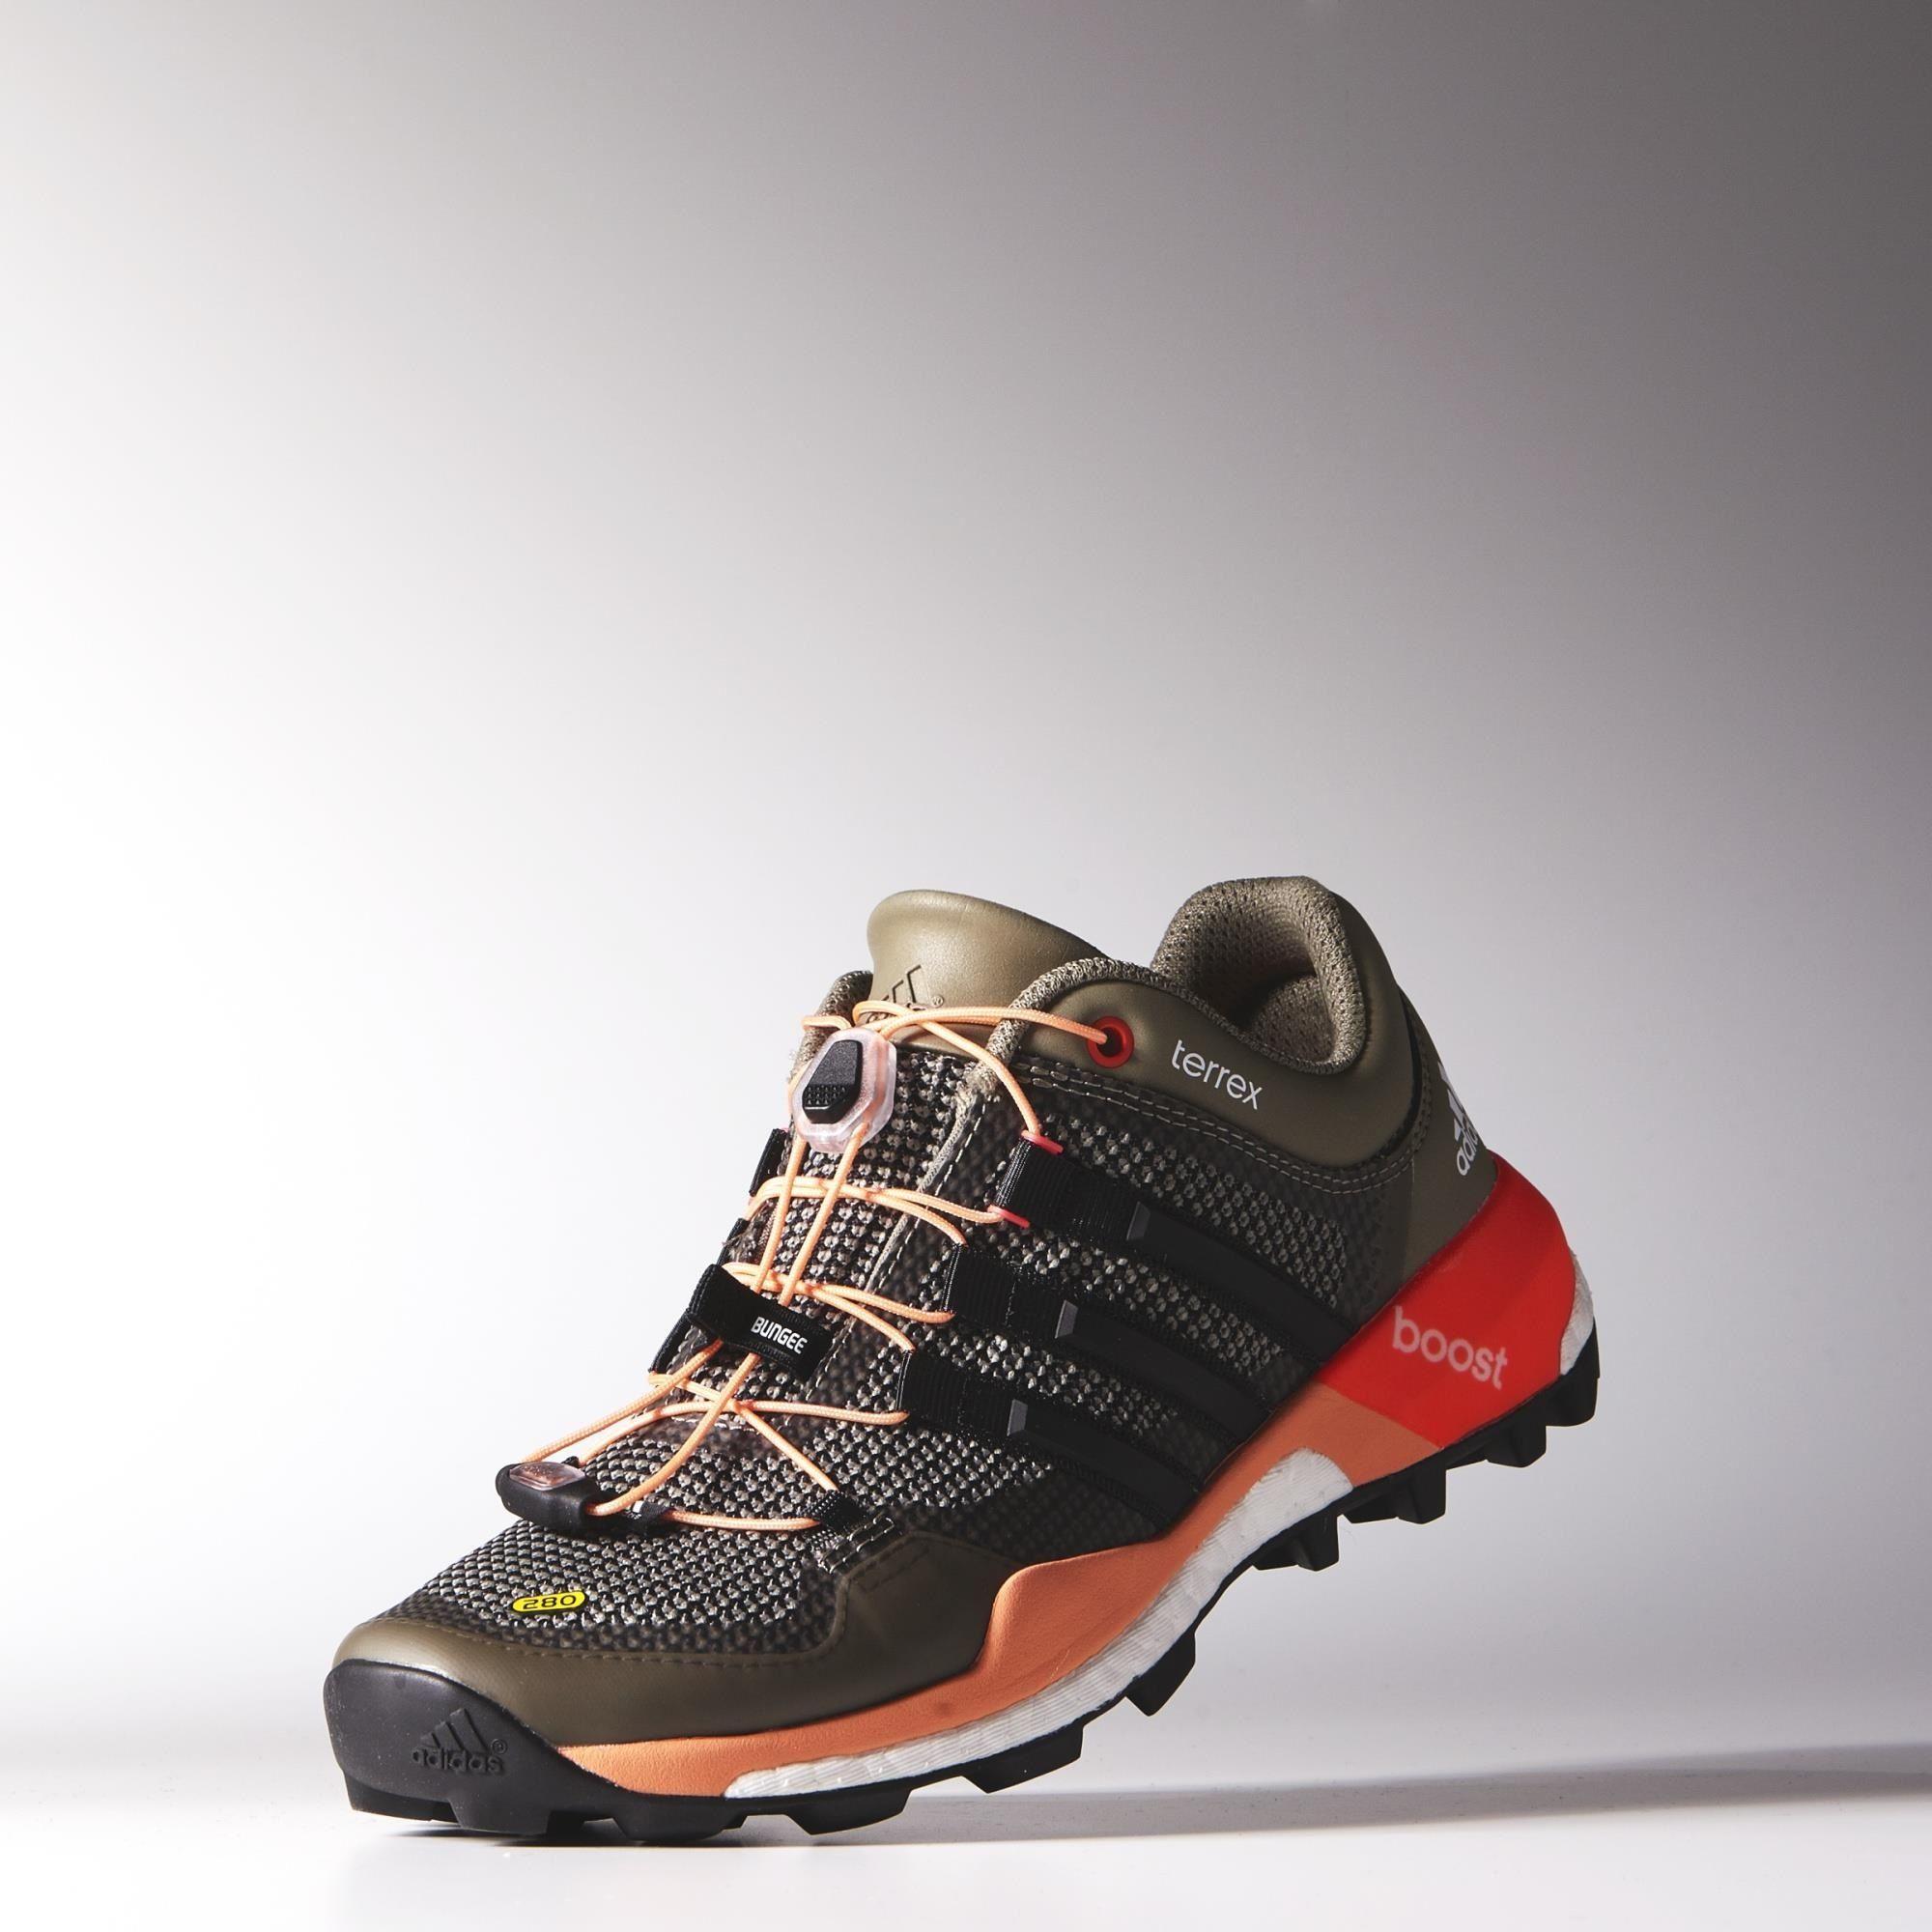 adidas - Terrex Boost Shoes